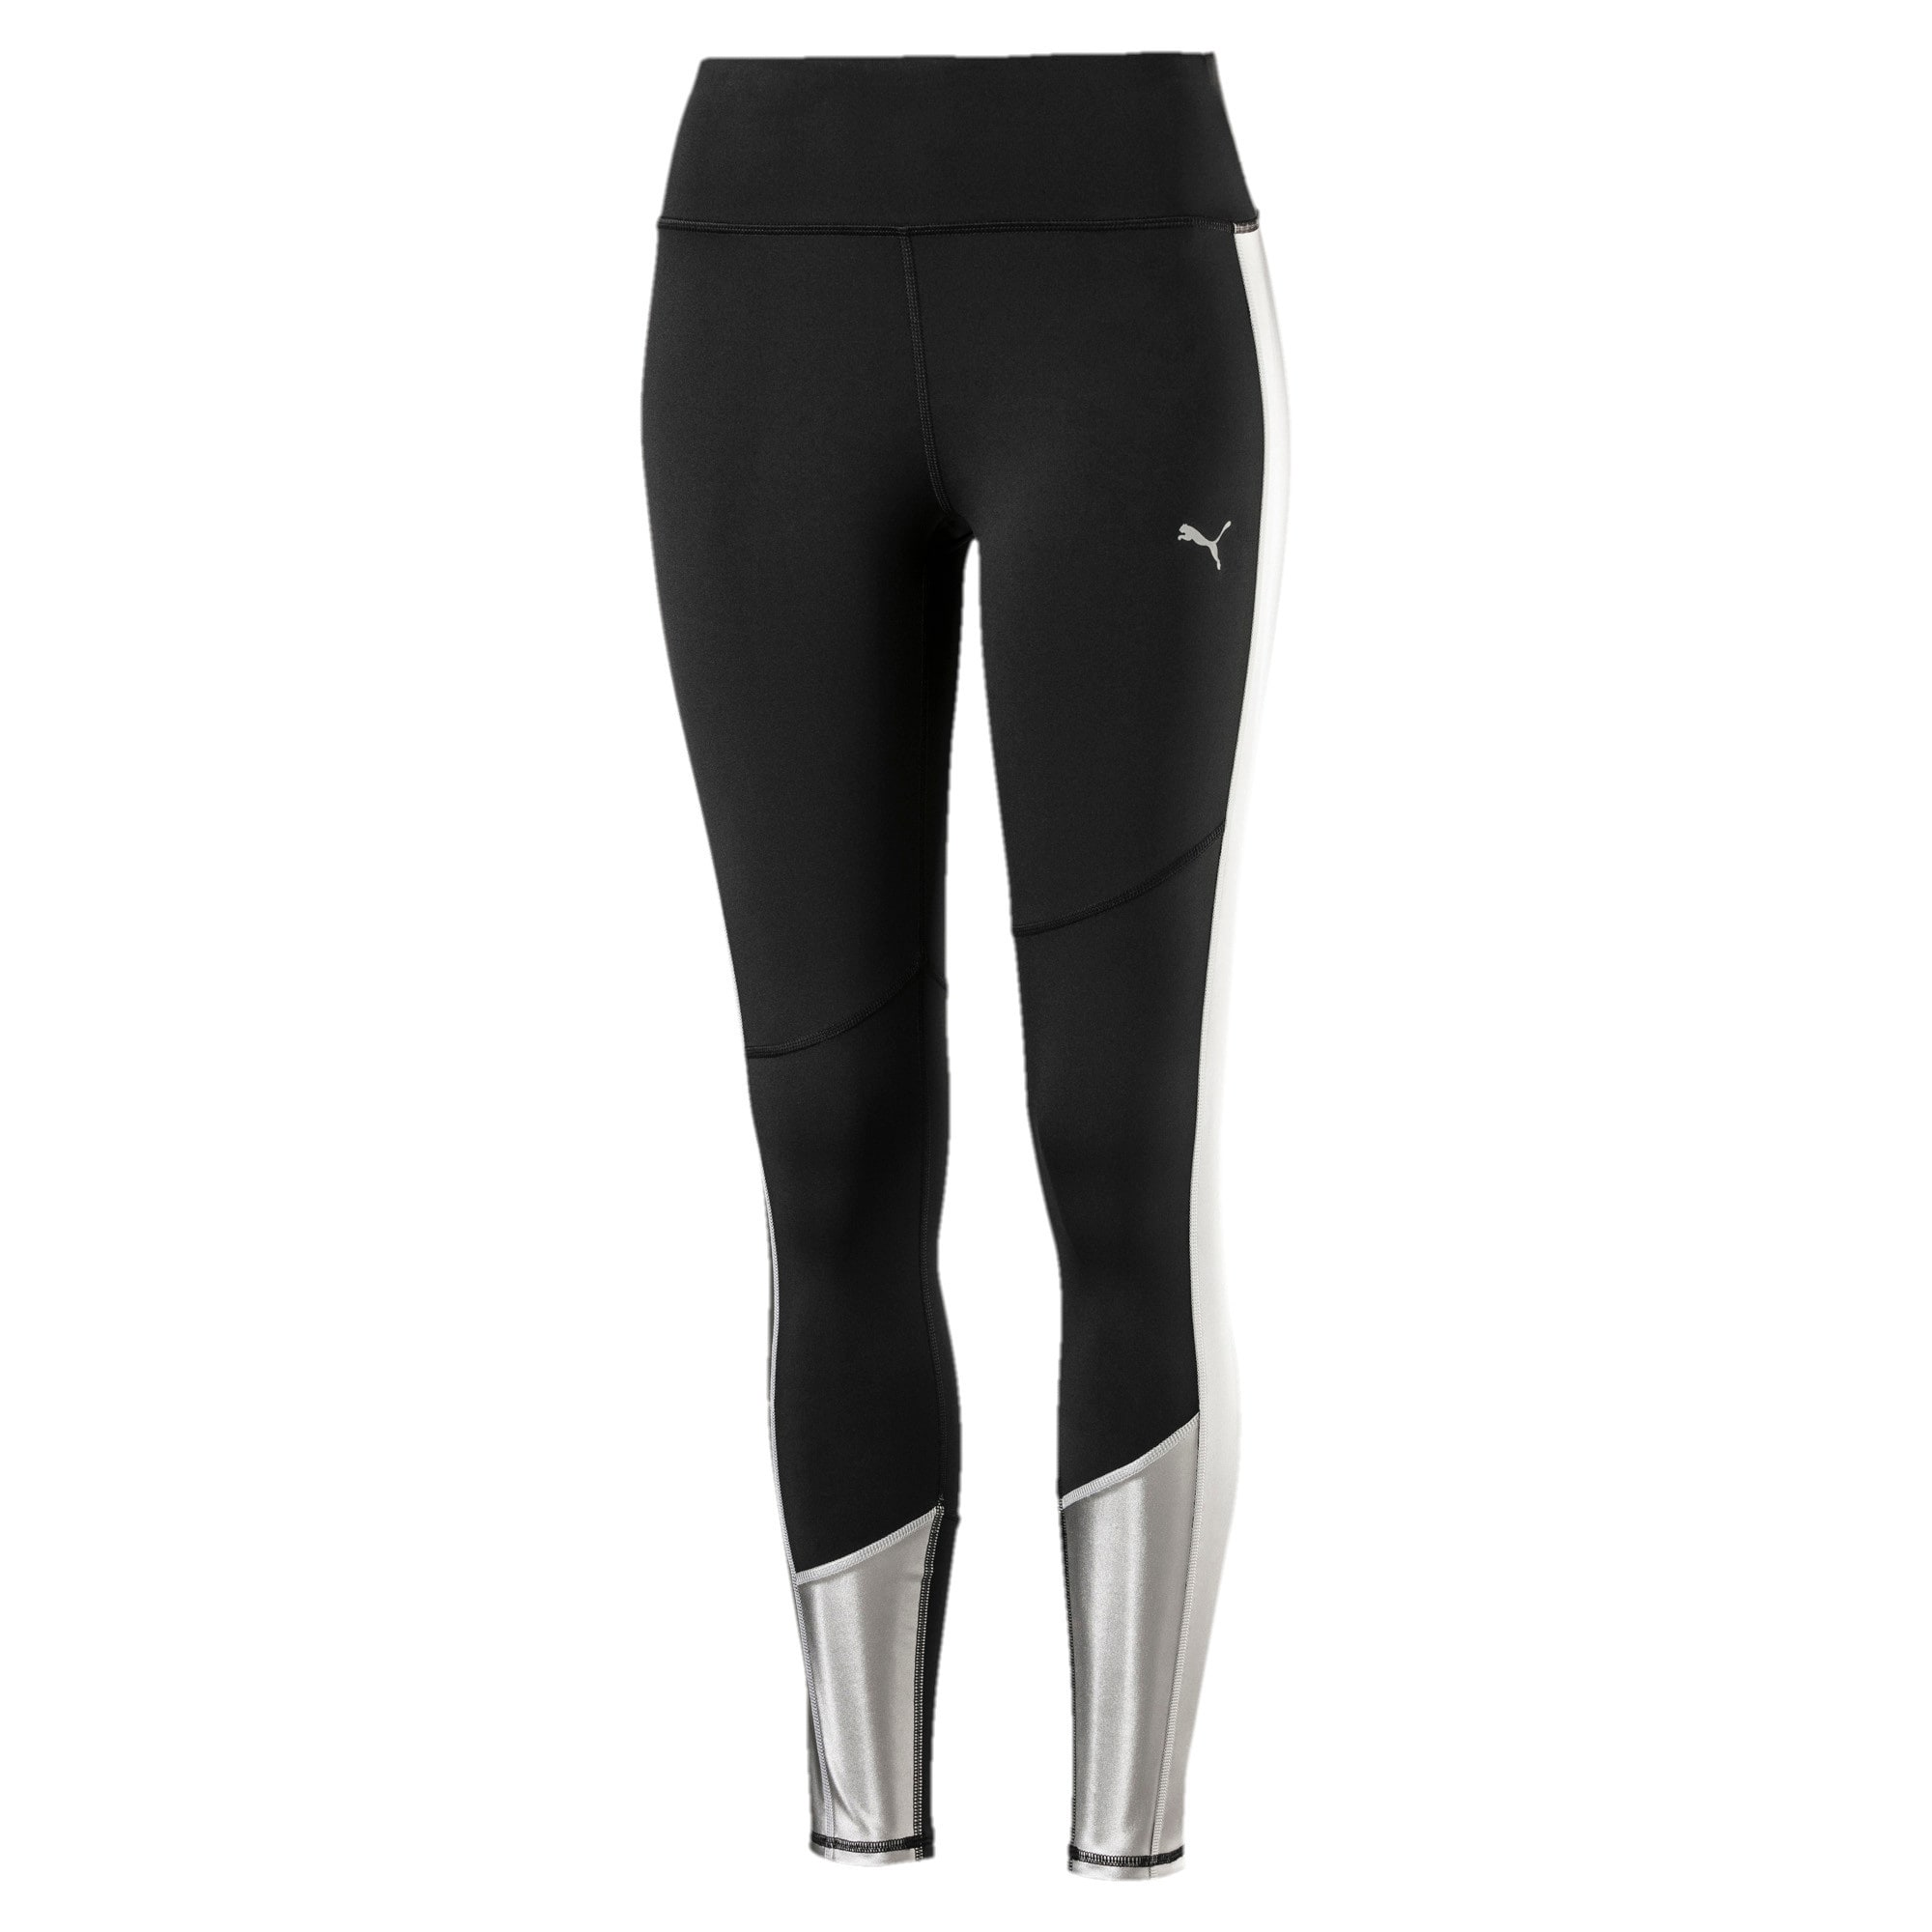 Thumbnail 1 of After Glow Mesh Women's Training Leggings, Puma Black-Titanium Silver, medium-IND